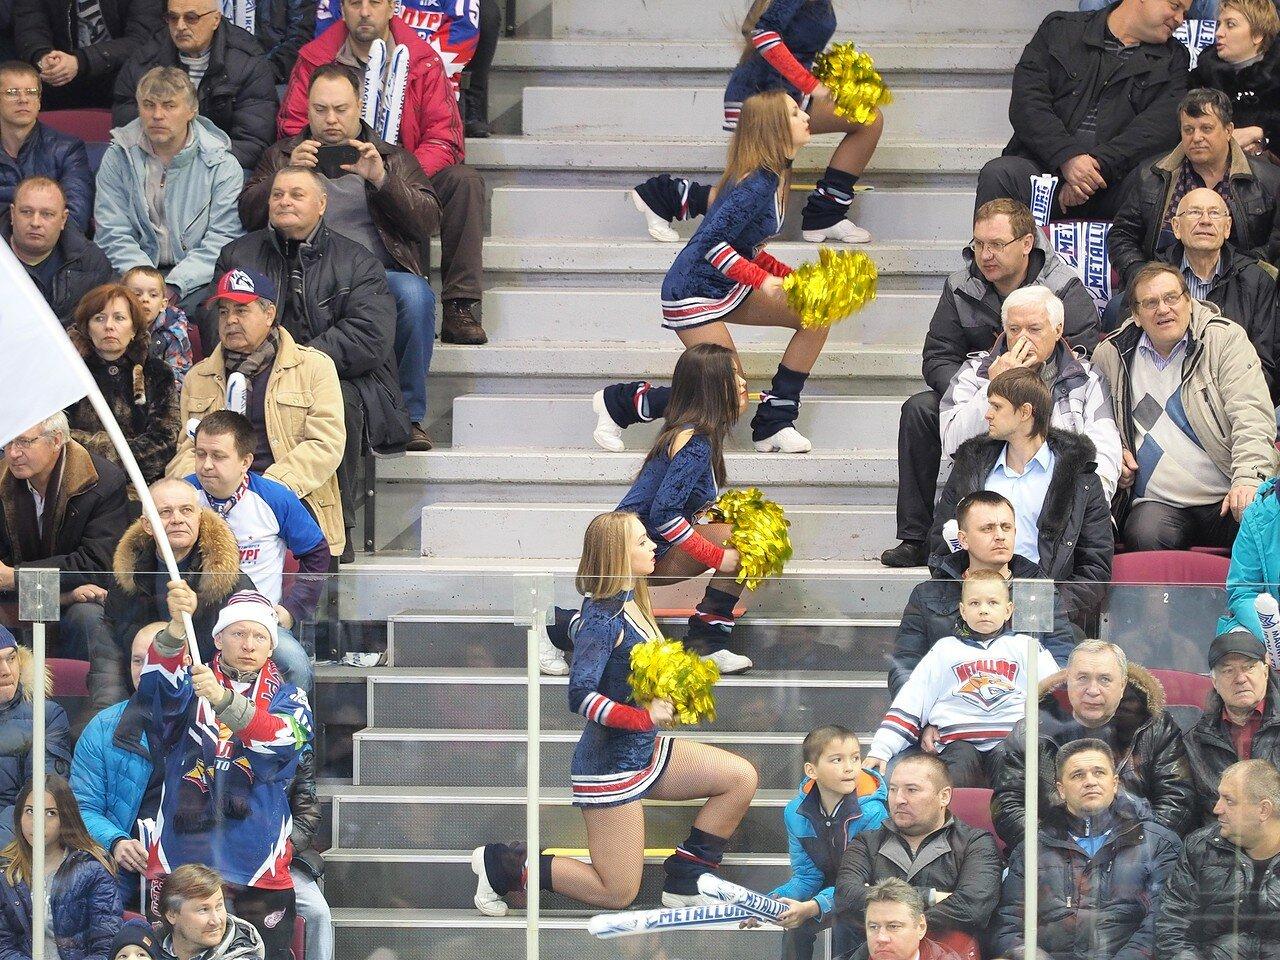 71Плей-офф 2016 Восток 1/2 Металлург - Сибирь 10.03.2016